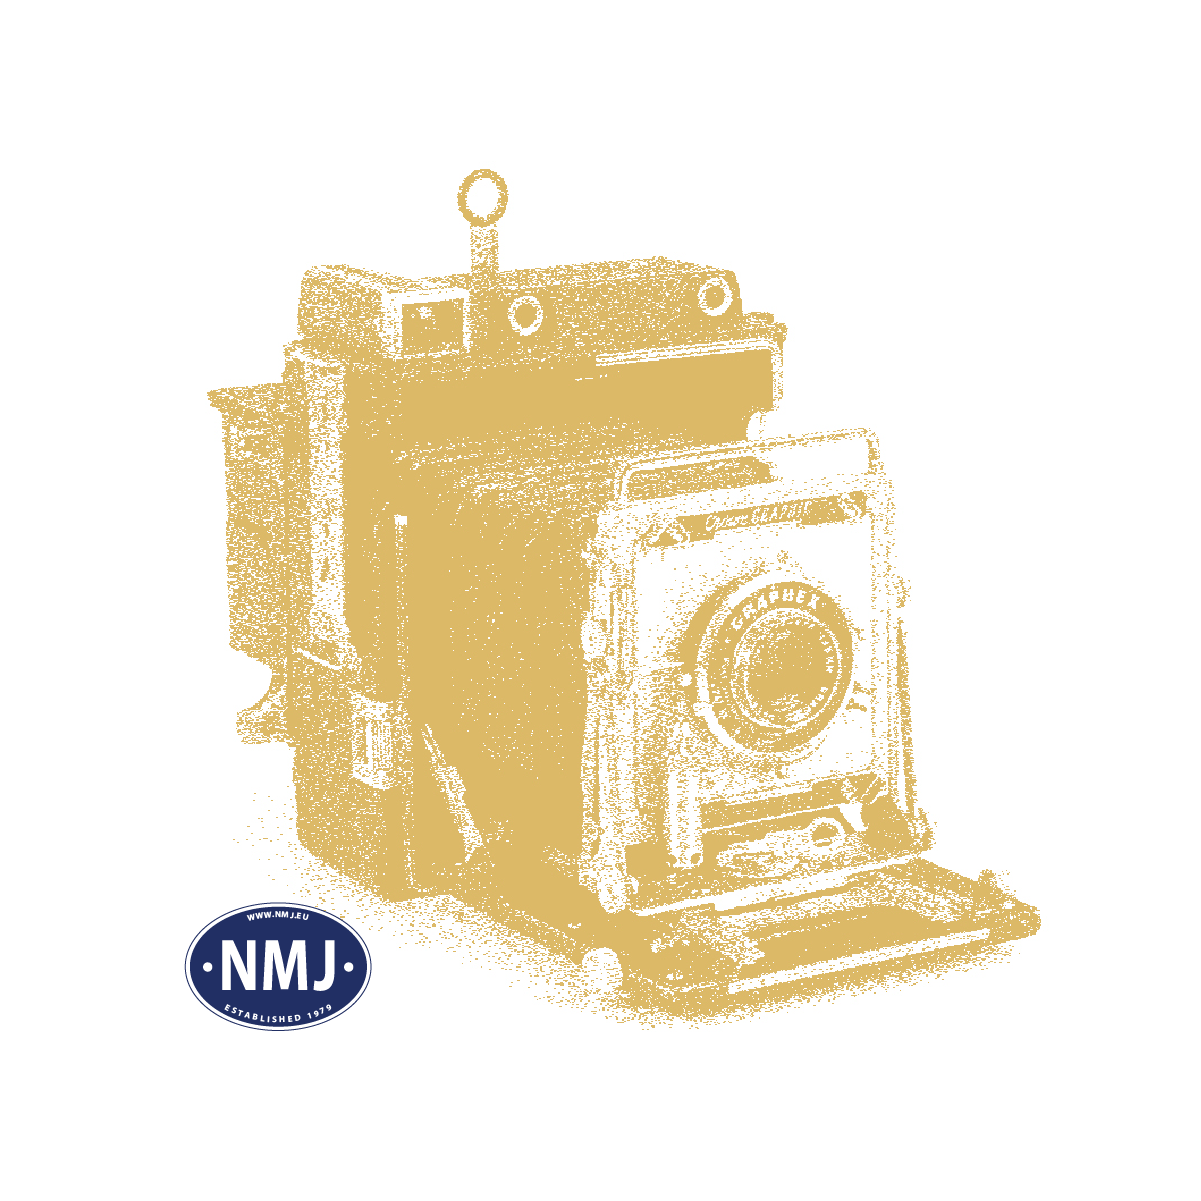 MRHHS30 - Aqueous Hobby Color Malingssett